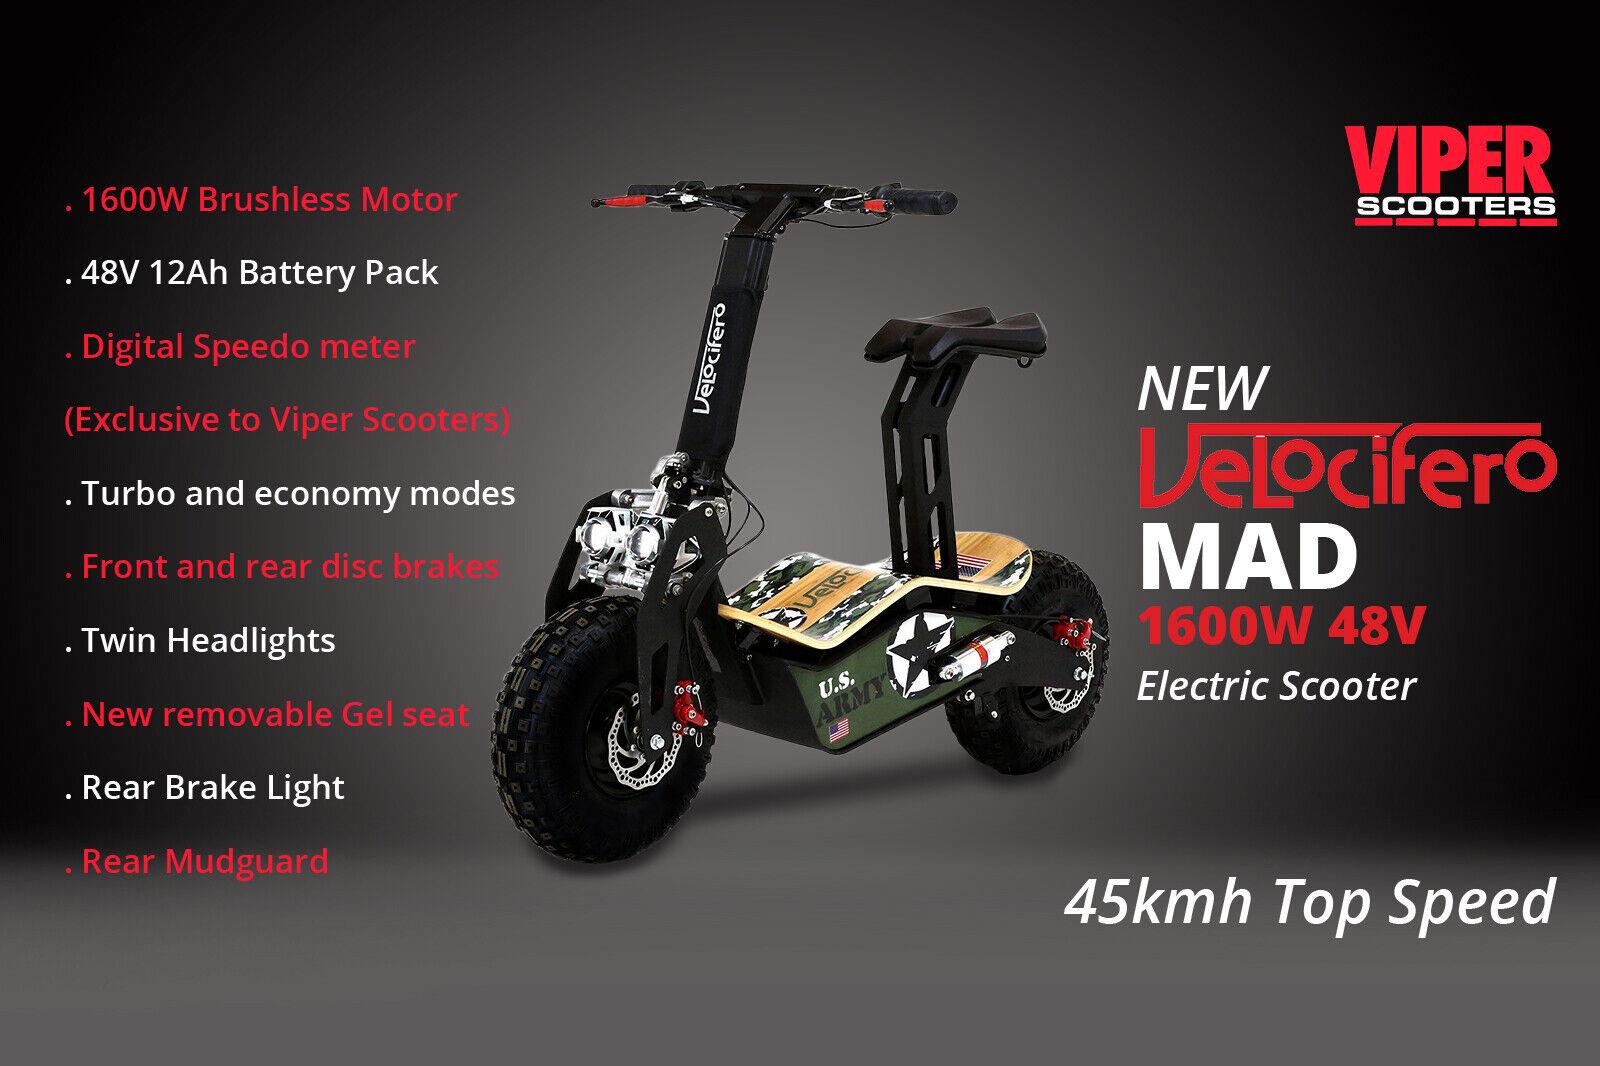 Nuevo Modelo 2019, Velocifero Mad 1600W 48V scooter eléctrico, ejército vs